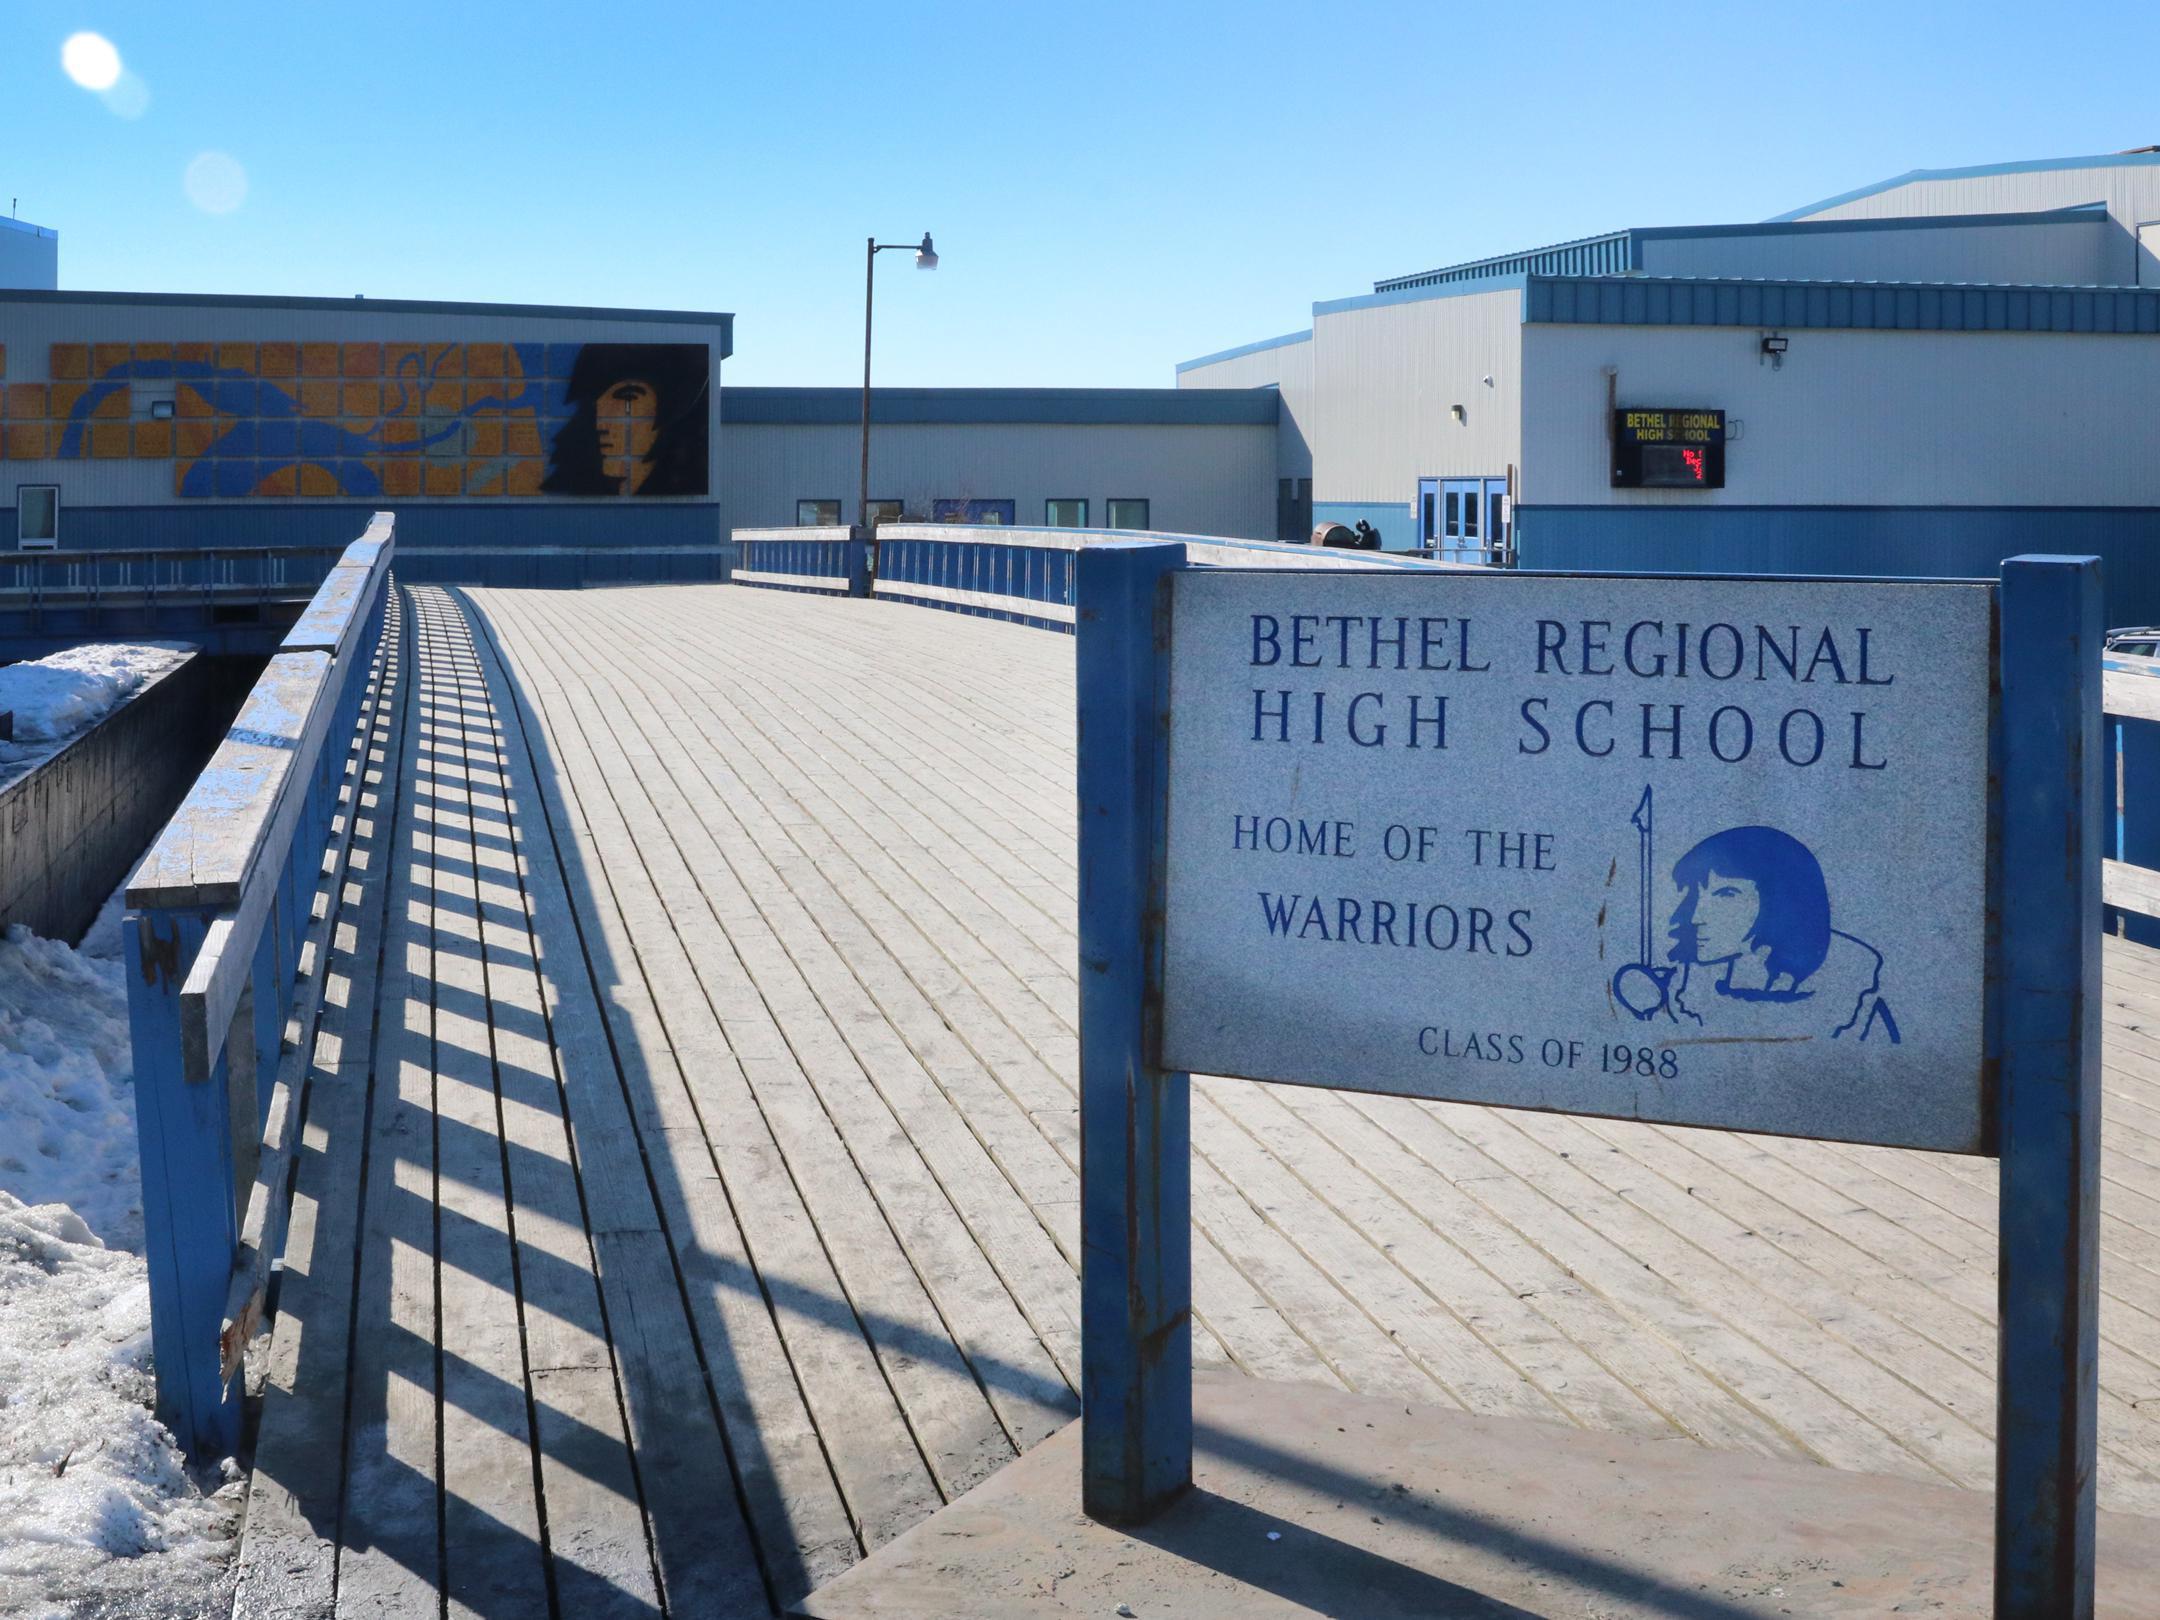 Twenty-one years ago, Principal Ron Edwards Sr. and Sophomore Josh Palacios were killed by student Evan Ramsey at Bethel Regional High School. (Photo by Dead Swope/KYUK)